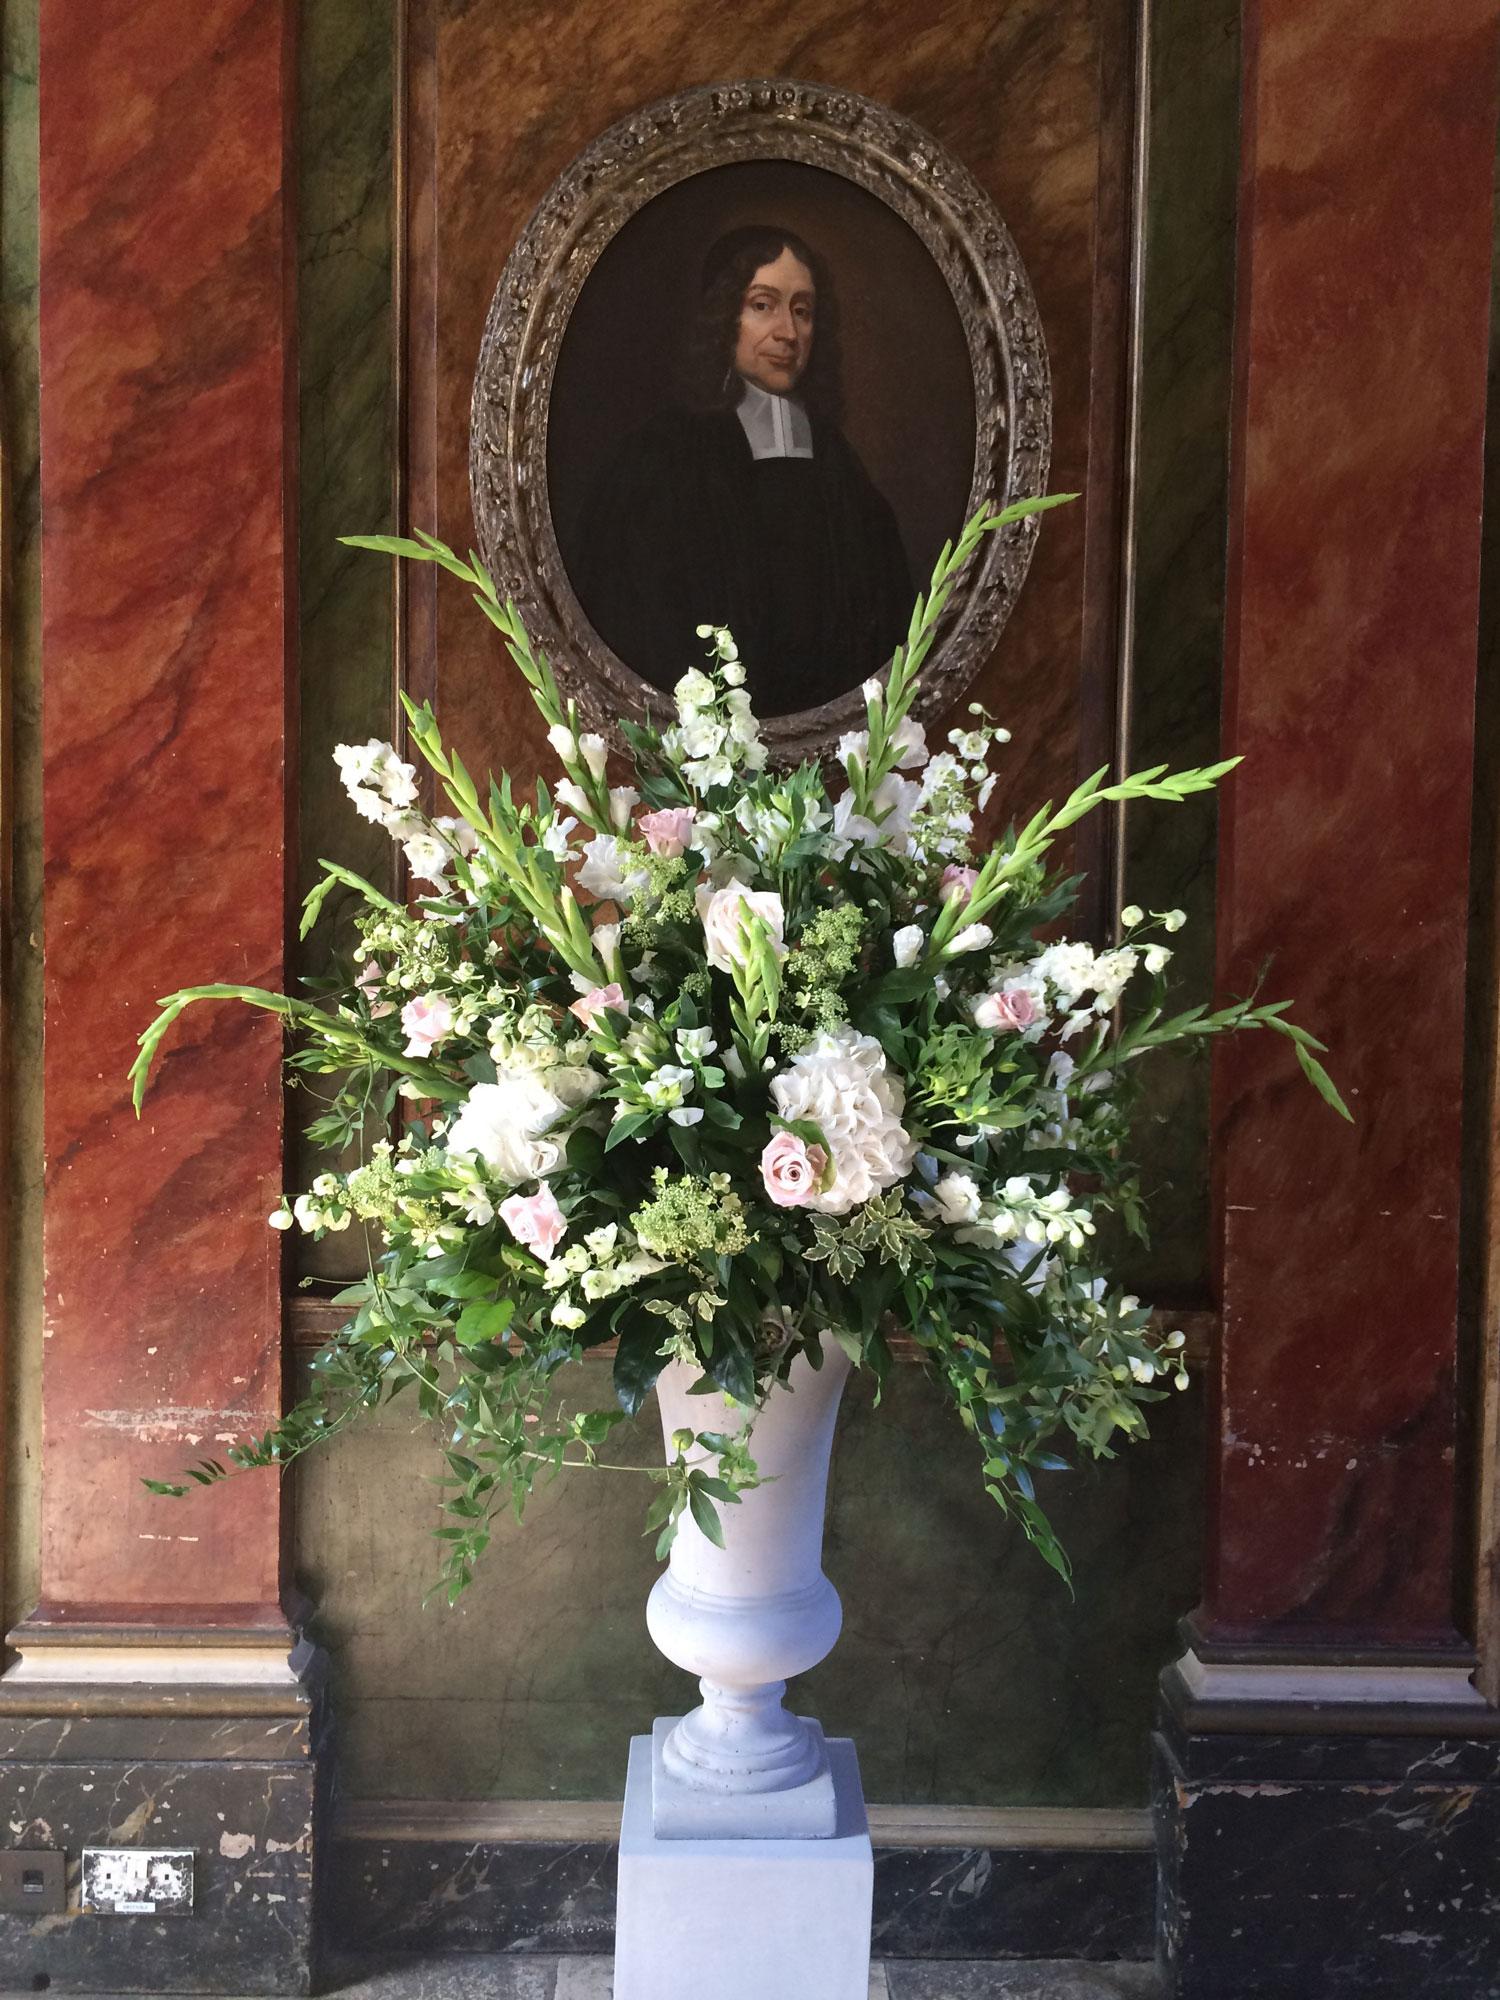 sarah-harper-floral-design-luxury-wedding-florist-flowers-oxfordshite-cotsworlds-gallery-urn-example--copy